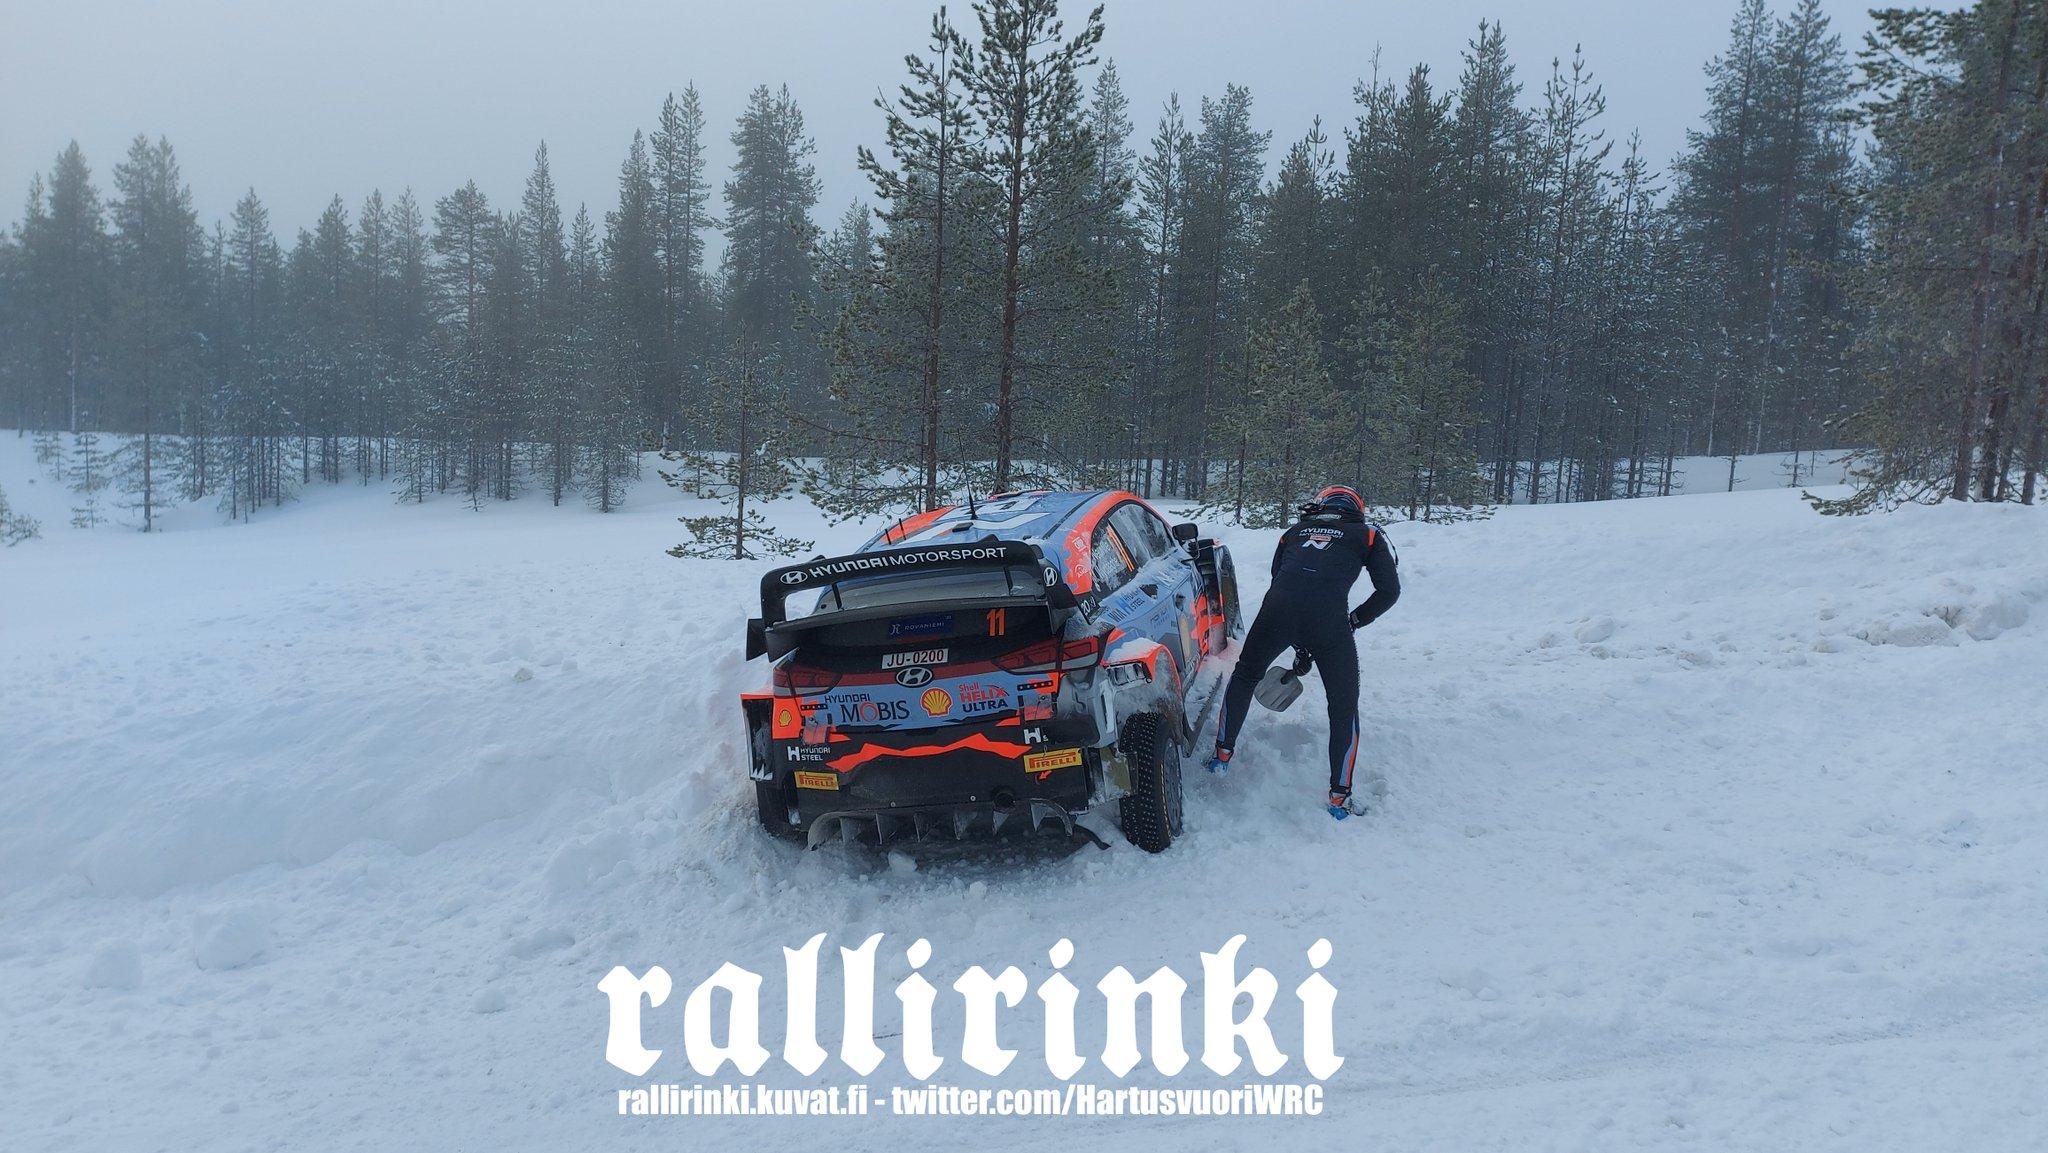 WRC: Arctic Rally Finland - Powered by CapitalBox [26-28 Febrero] - Página 2 EvIrO3jXEAADg9-?format=jpg&name=large